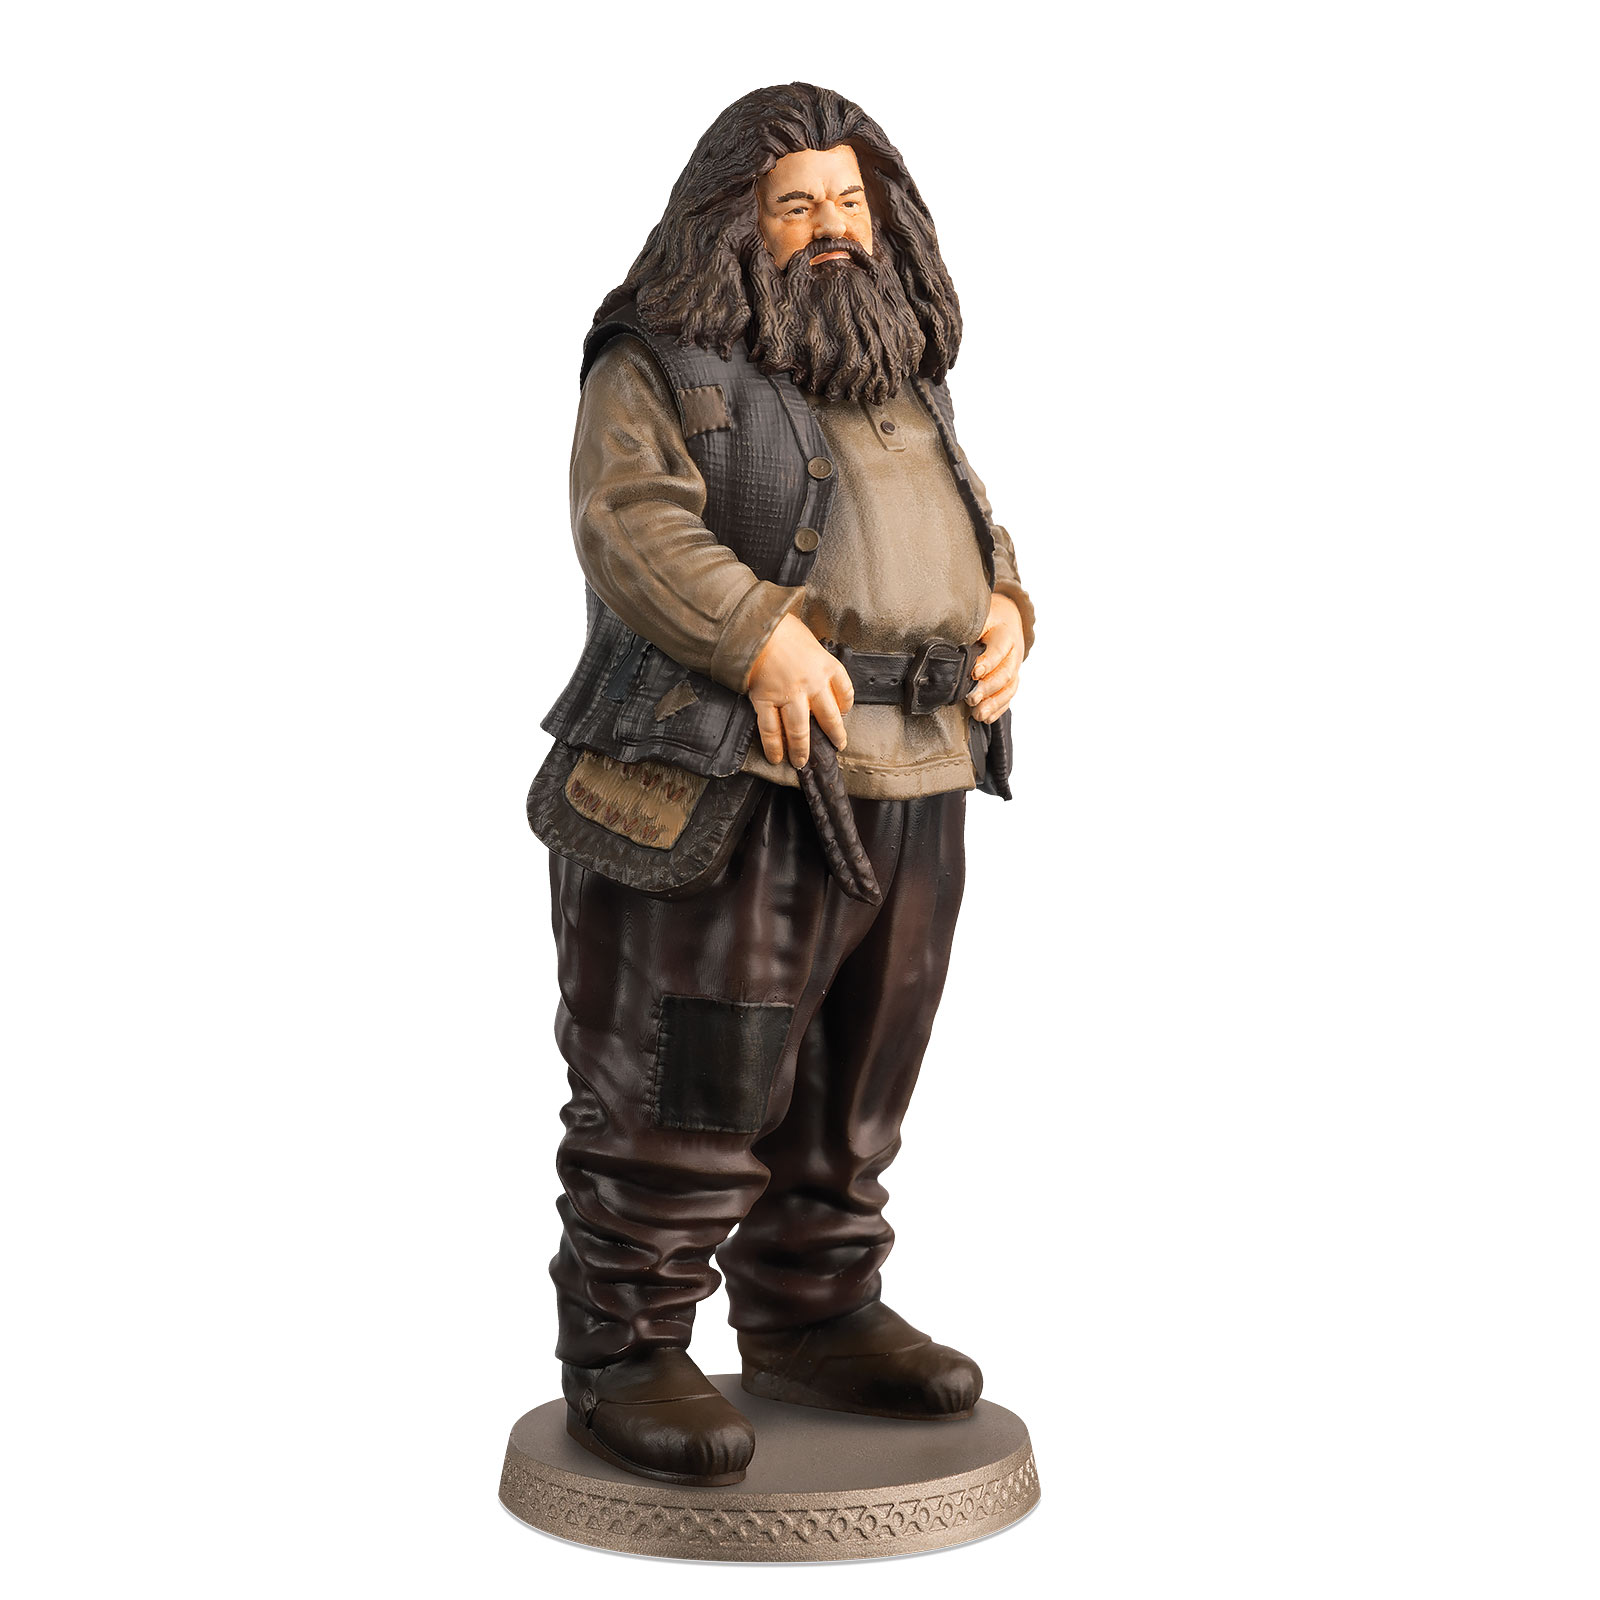 Rubeus Hagrid Hero Collector Figur 15 cm - Harry Potter